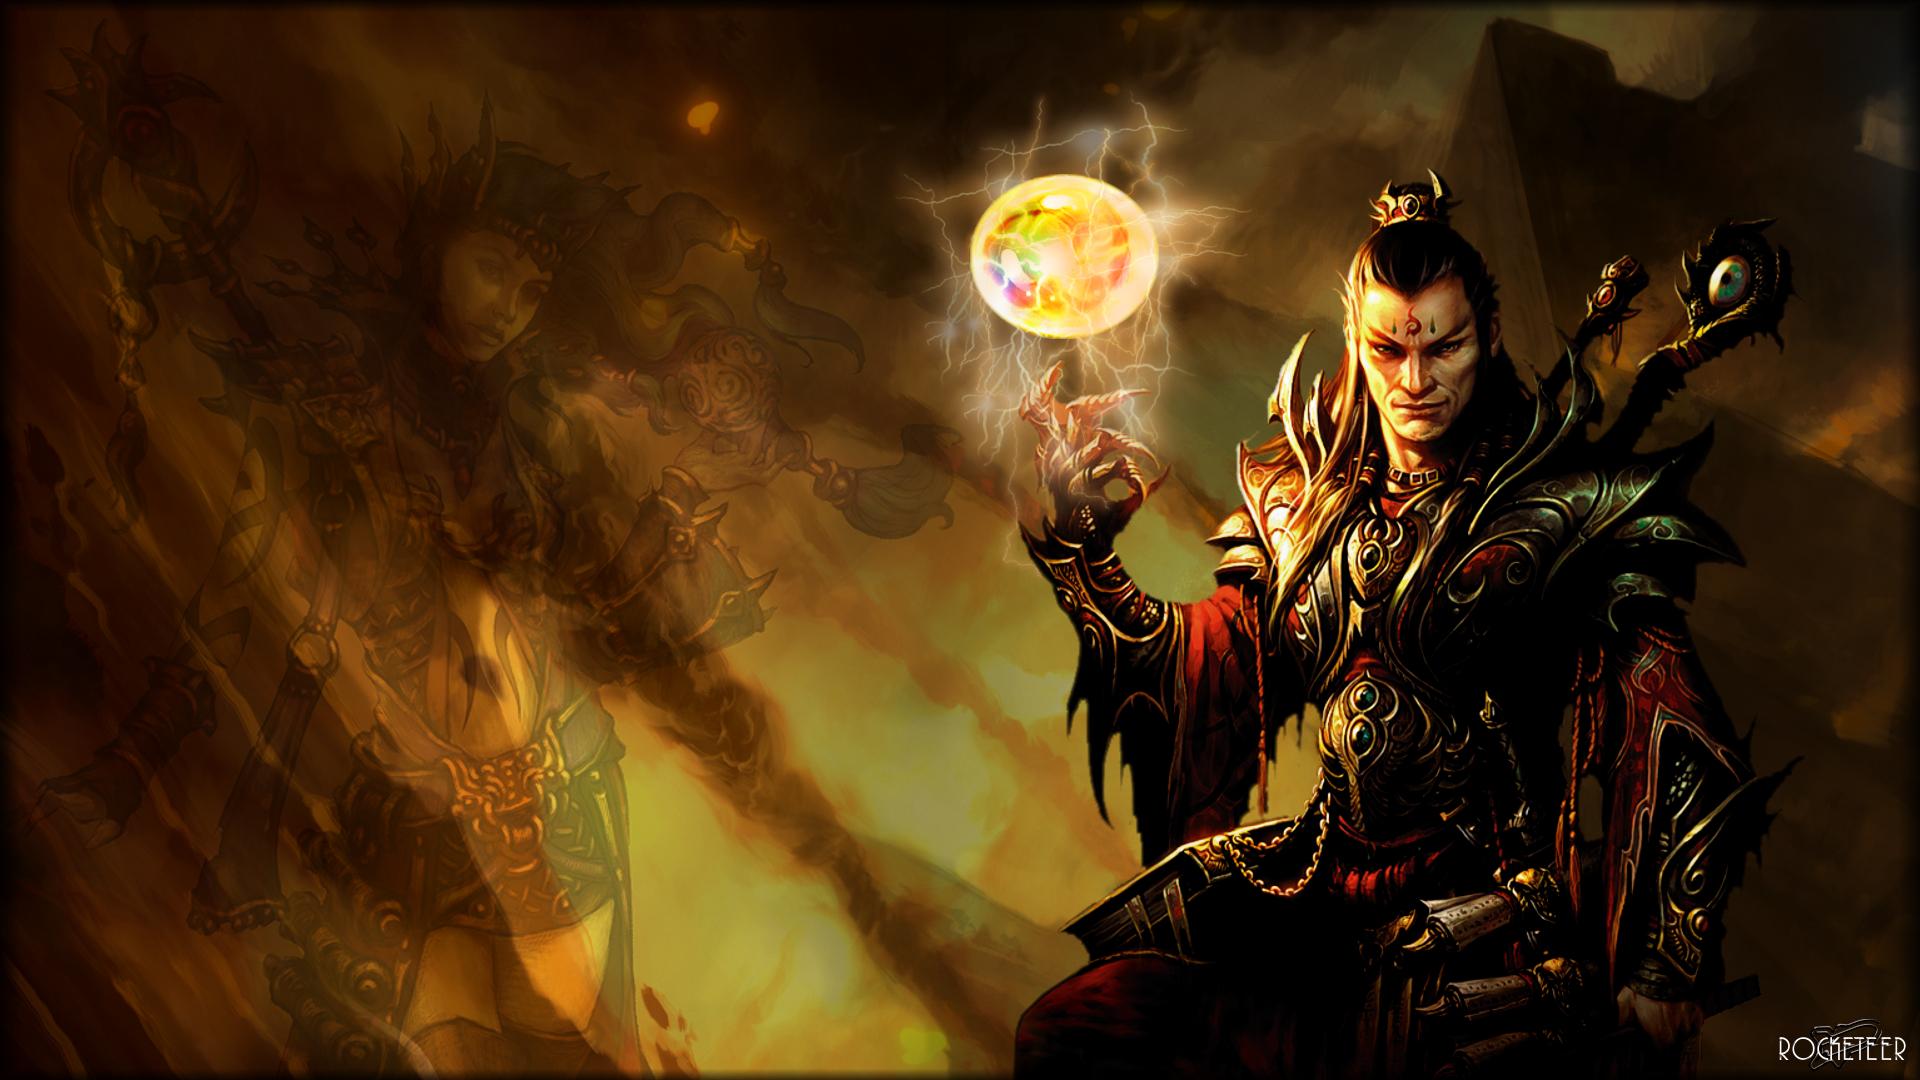 49+] Diablo 3 Wizard Wallpaper on WallpaperSafari